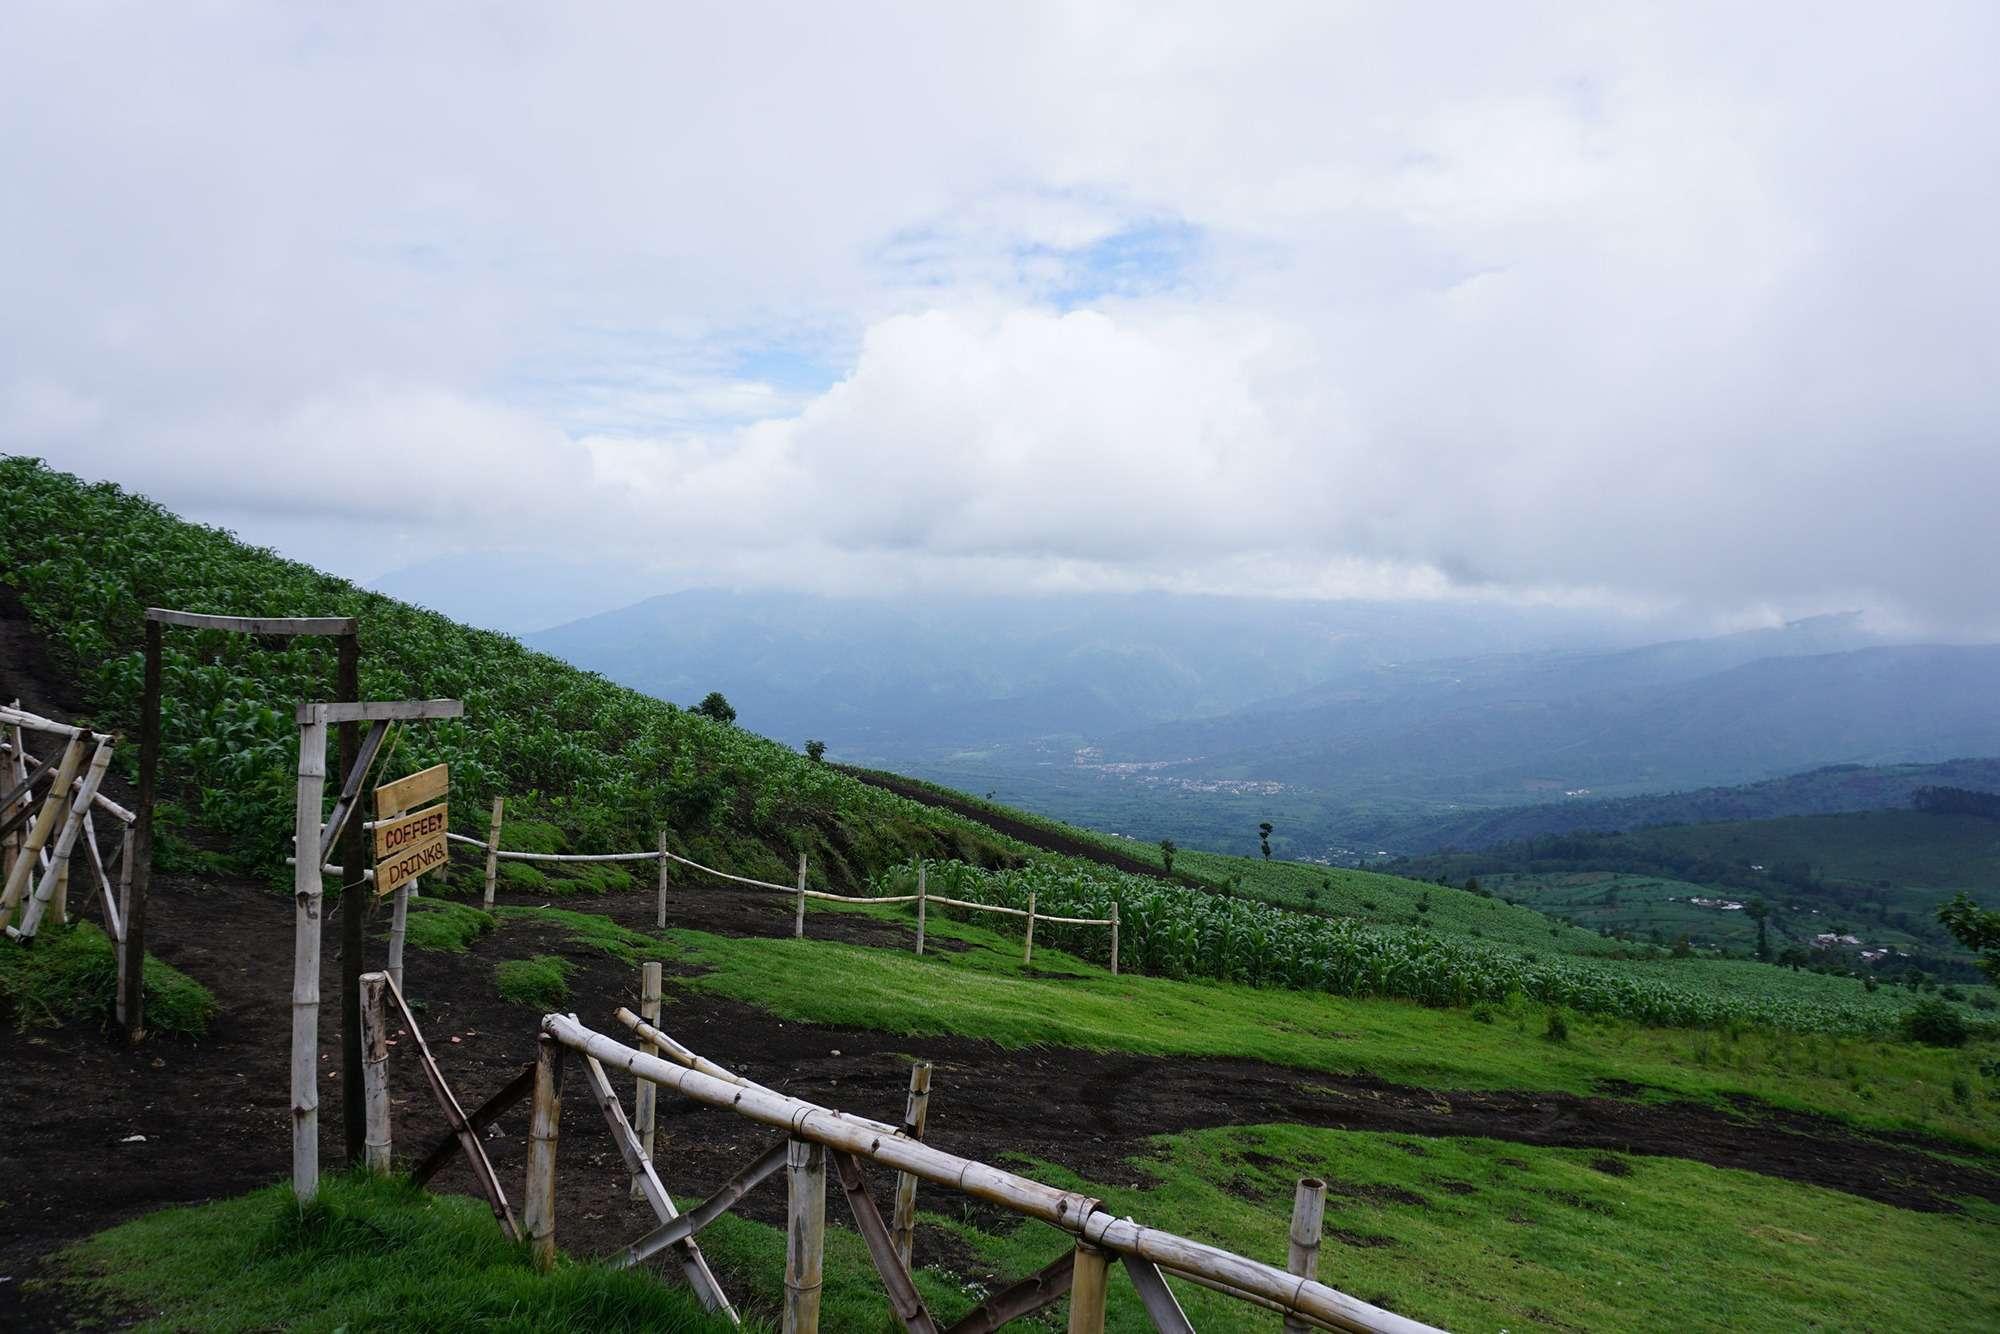 Green farm fields in Guatemala near Acatenango volcano